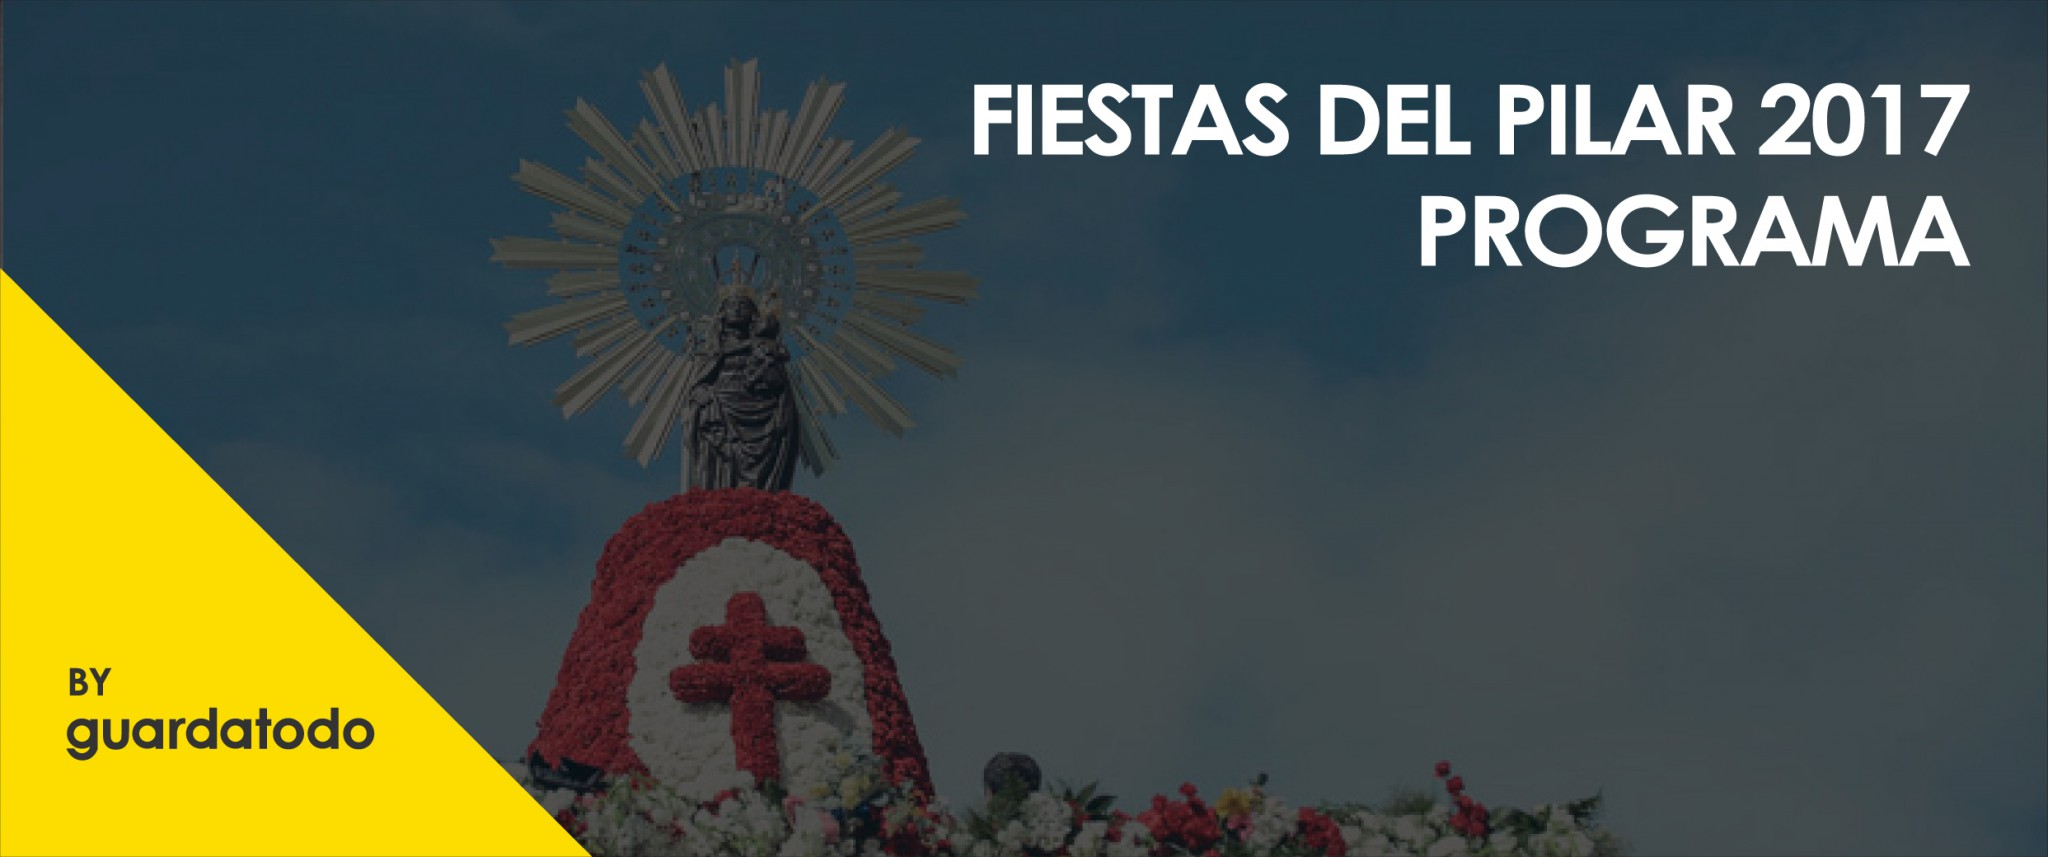 FIESTAS DEL PILAR 2017. PROGRAMA-01